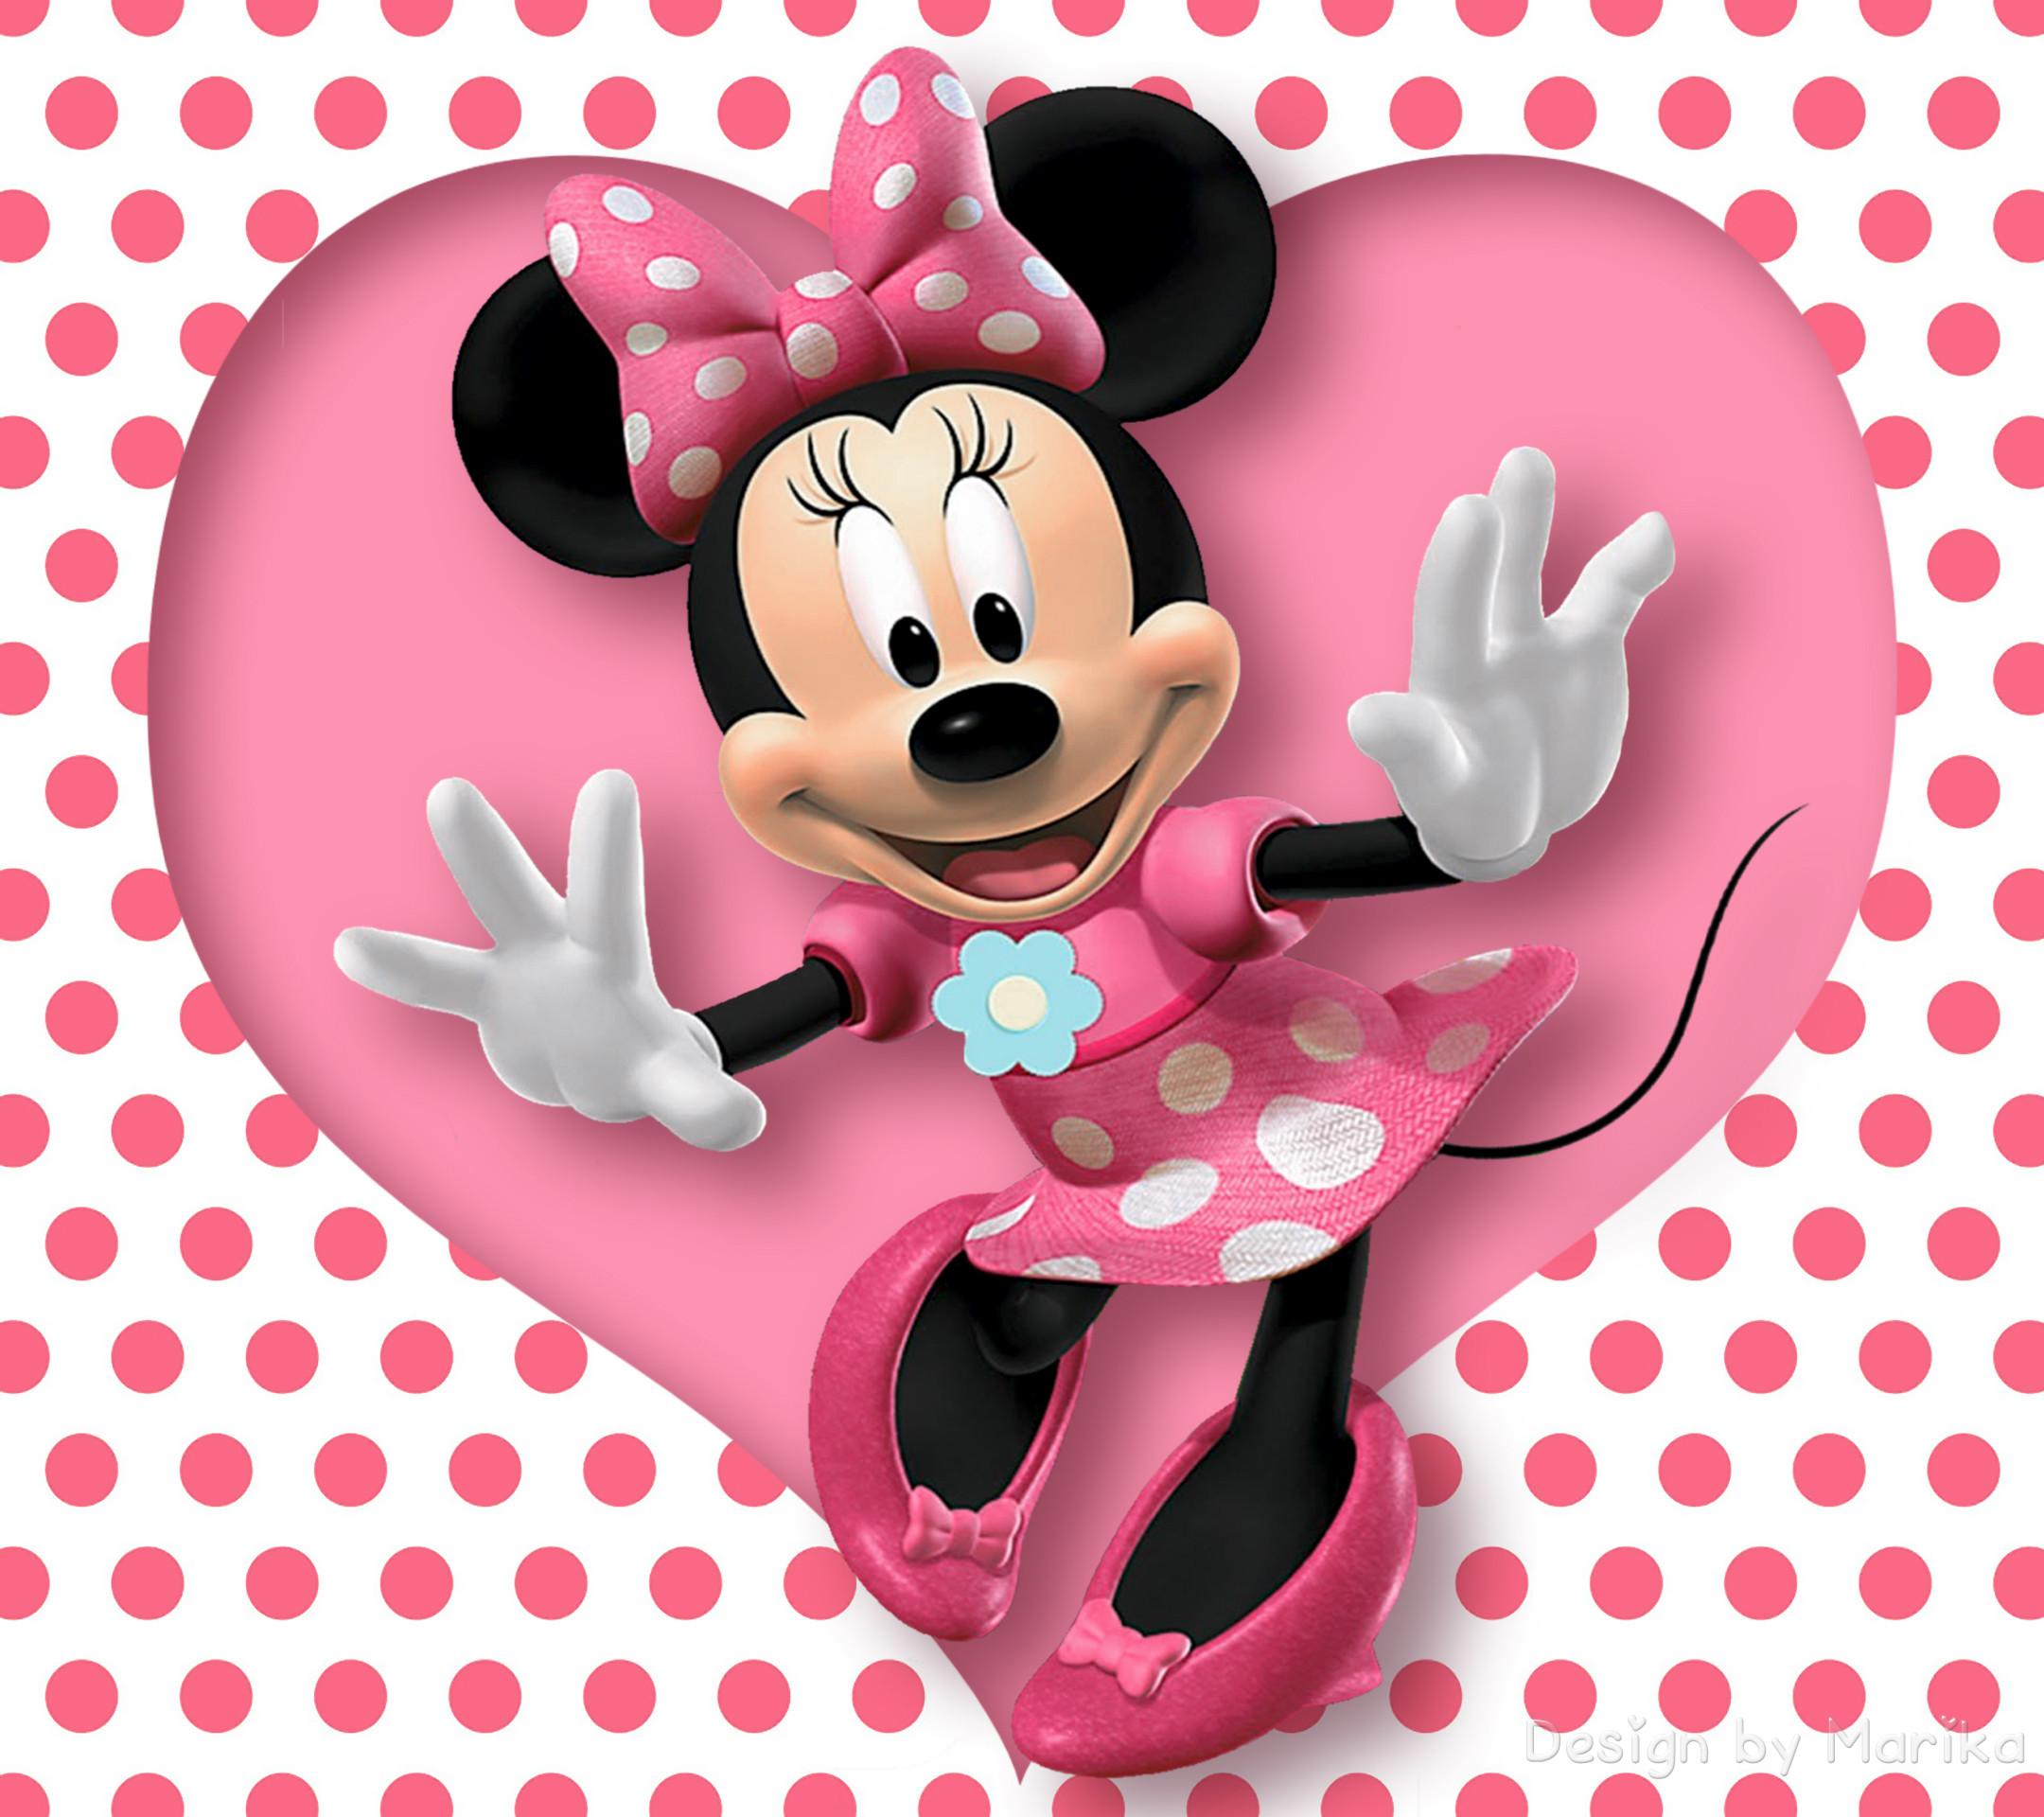 Disney Valentines Day Wallpaper 69 Images